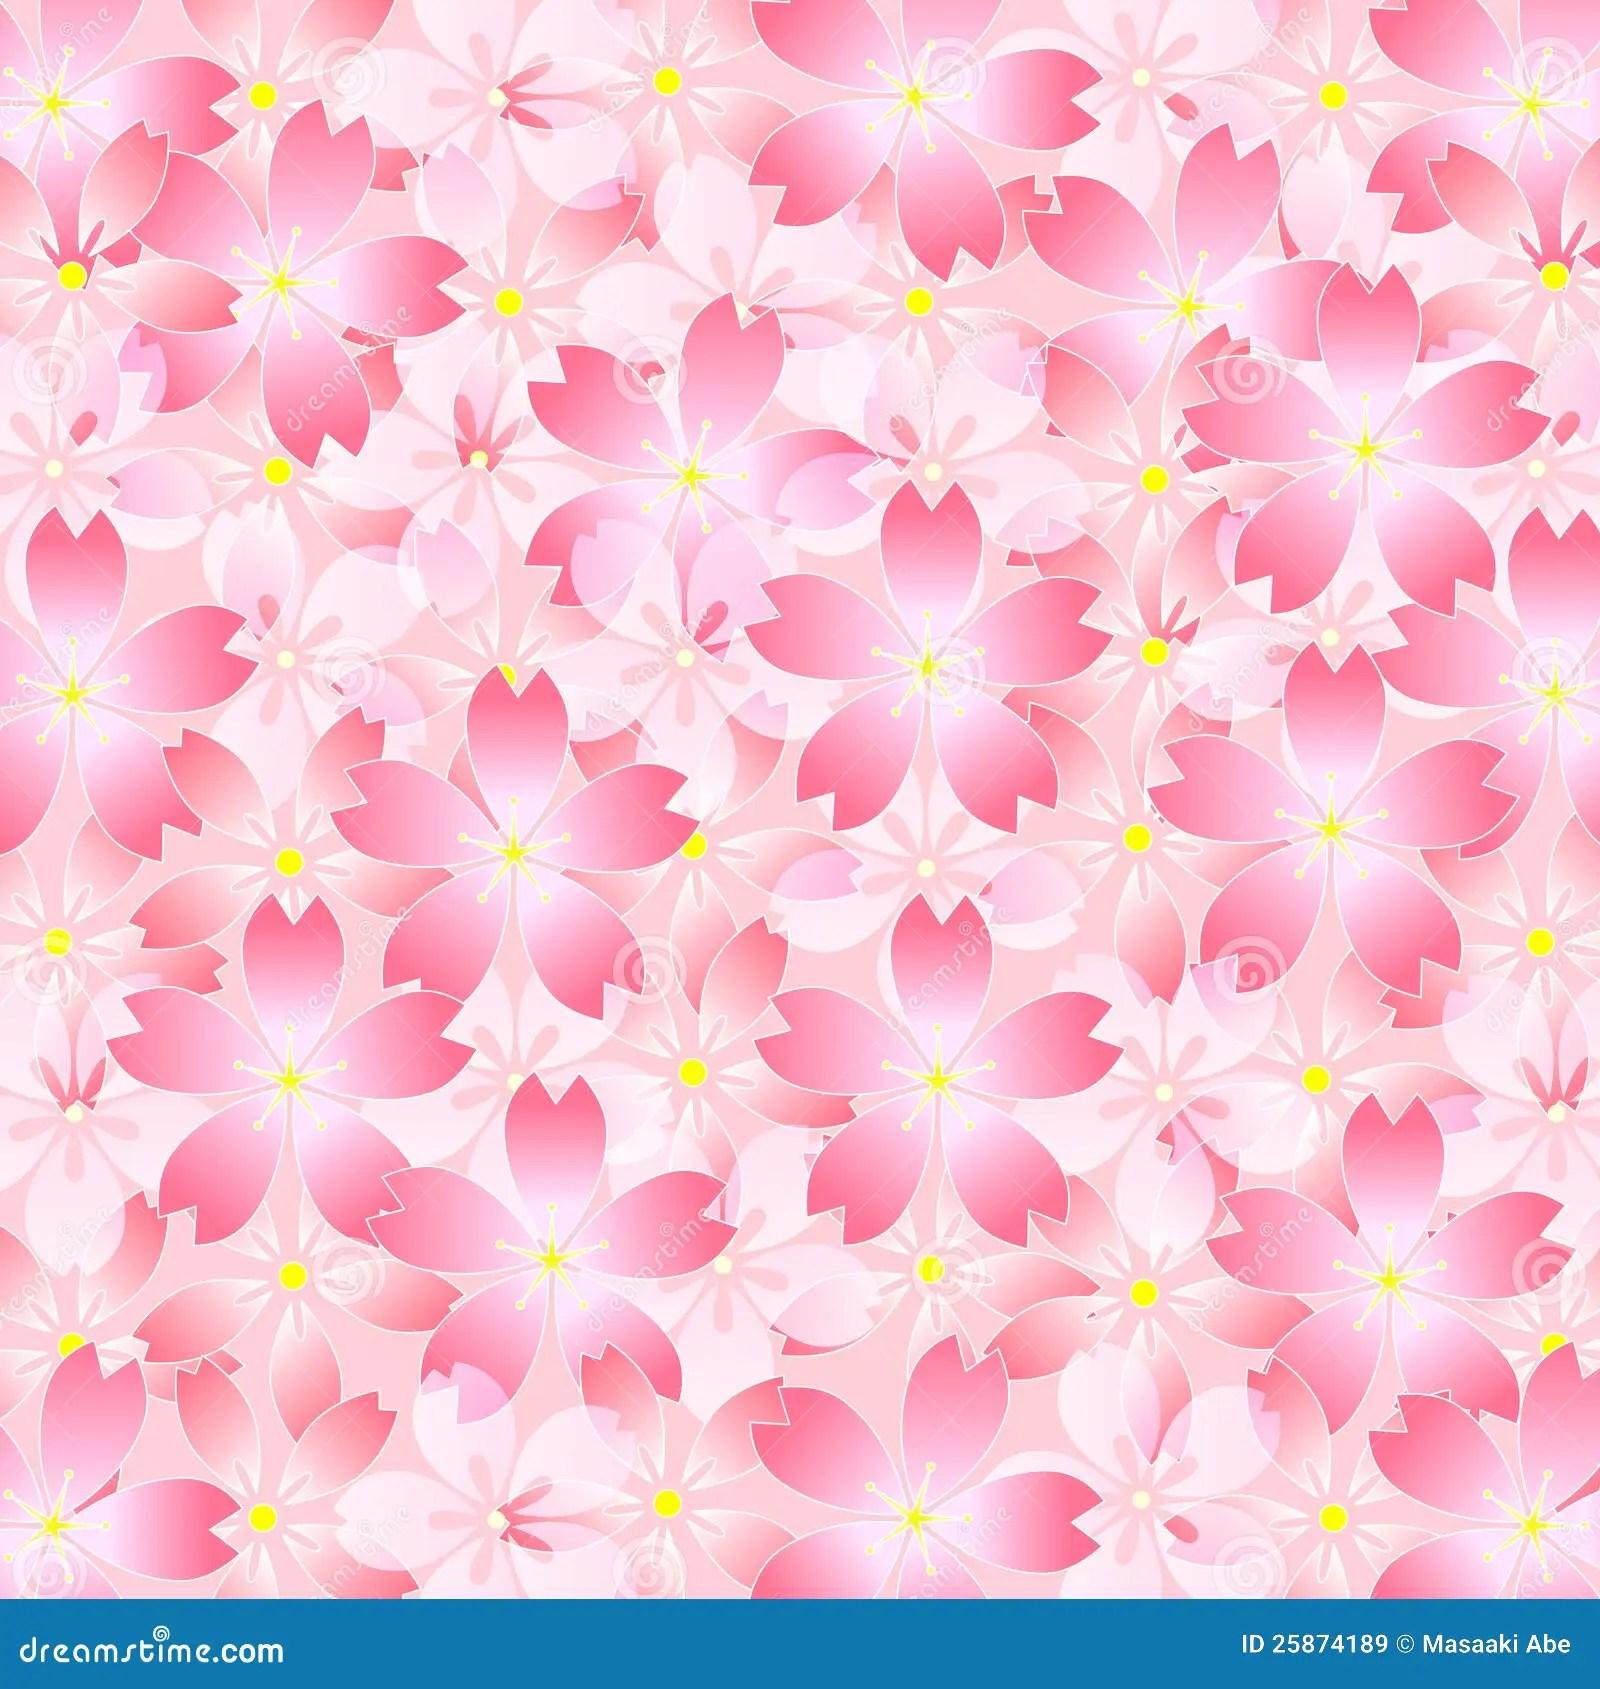 Cherry Blossom Wallpaper Hd Sakura Cherry Tree Background Royalty Free Stock Images